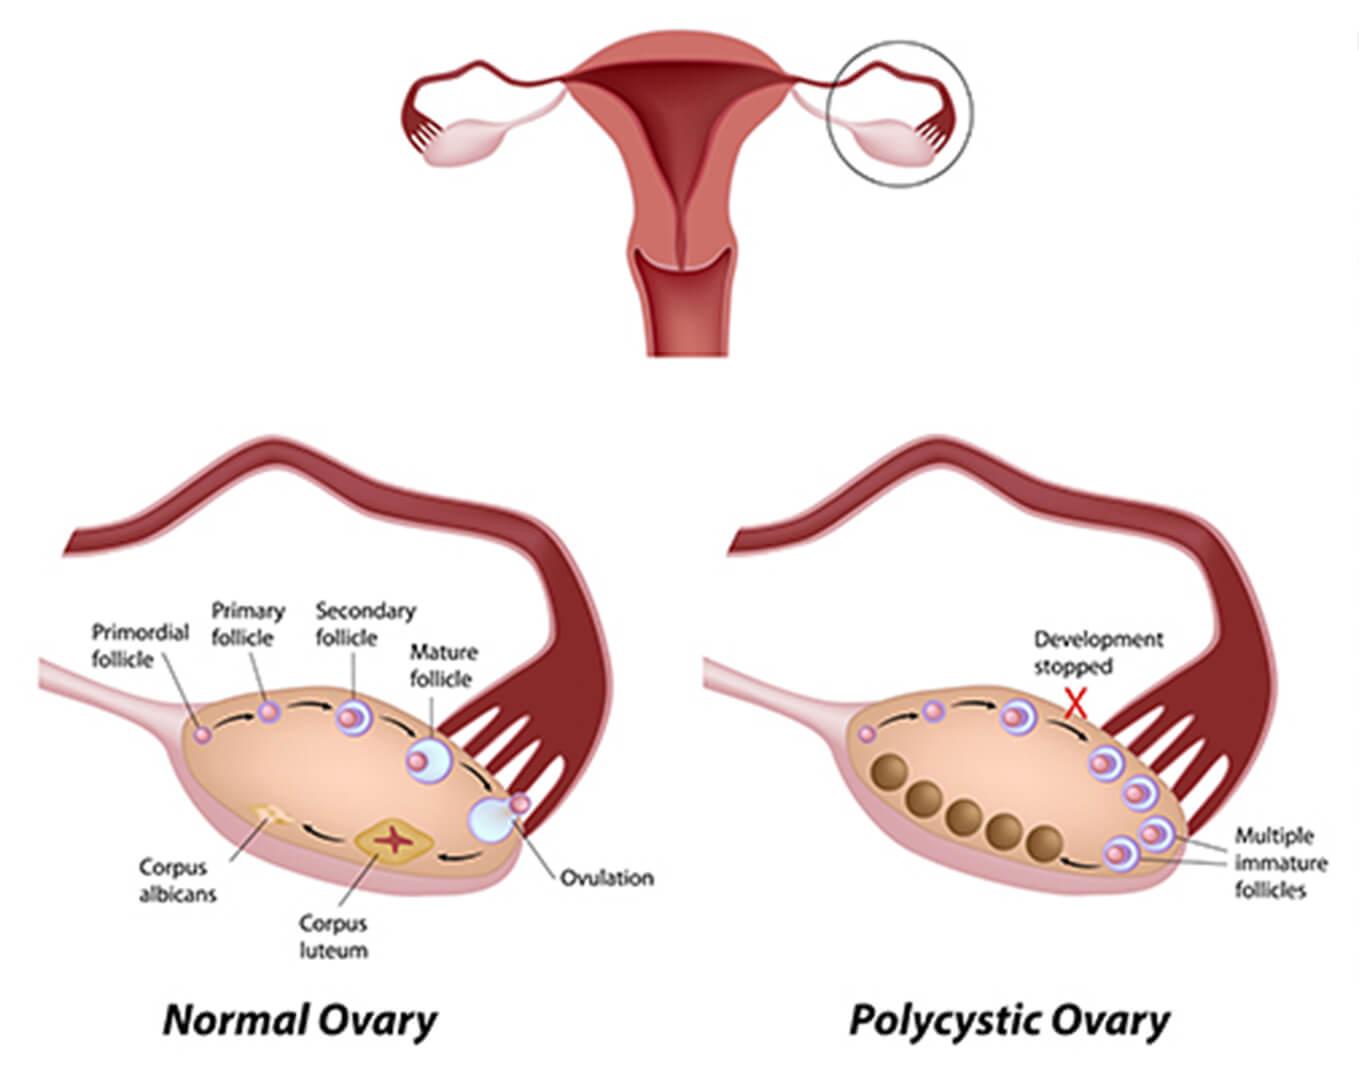 Polycystic Ovary Diagram